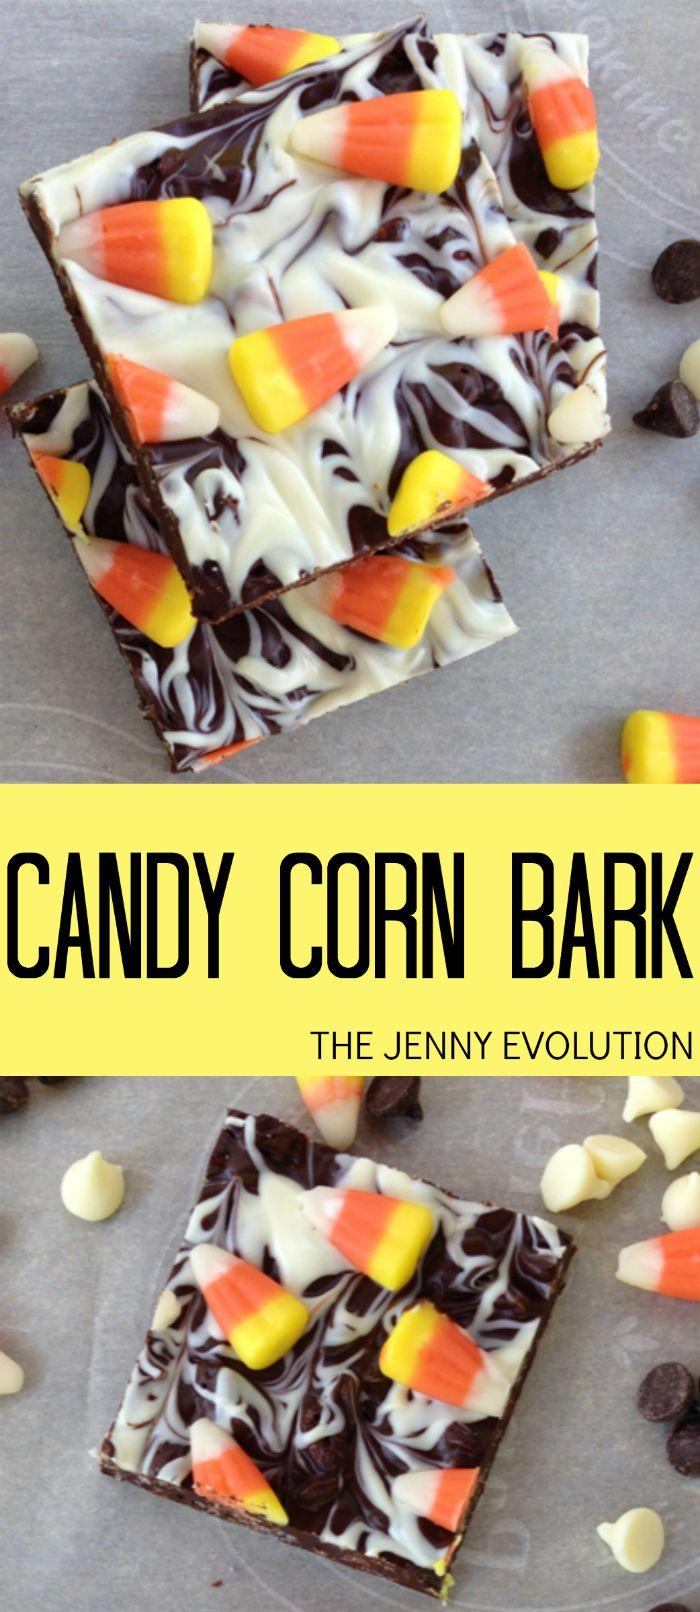 Candy Corn Bark Recipe | The Jenny Evolution